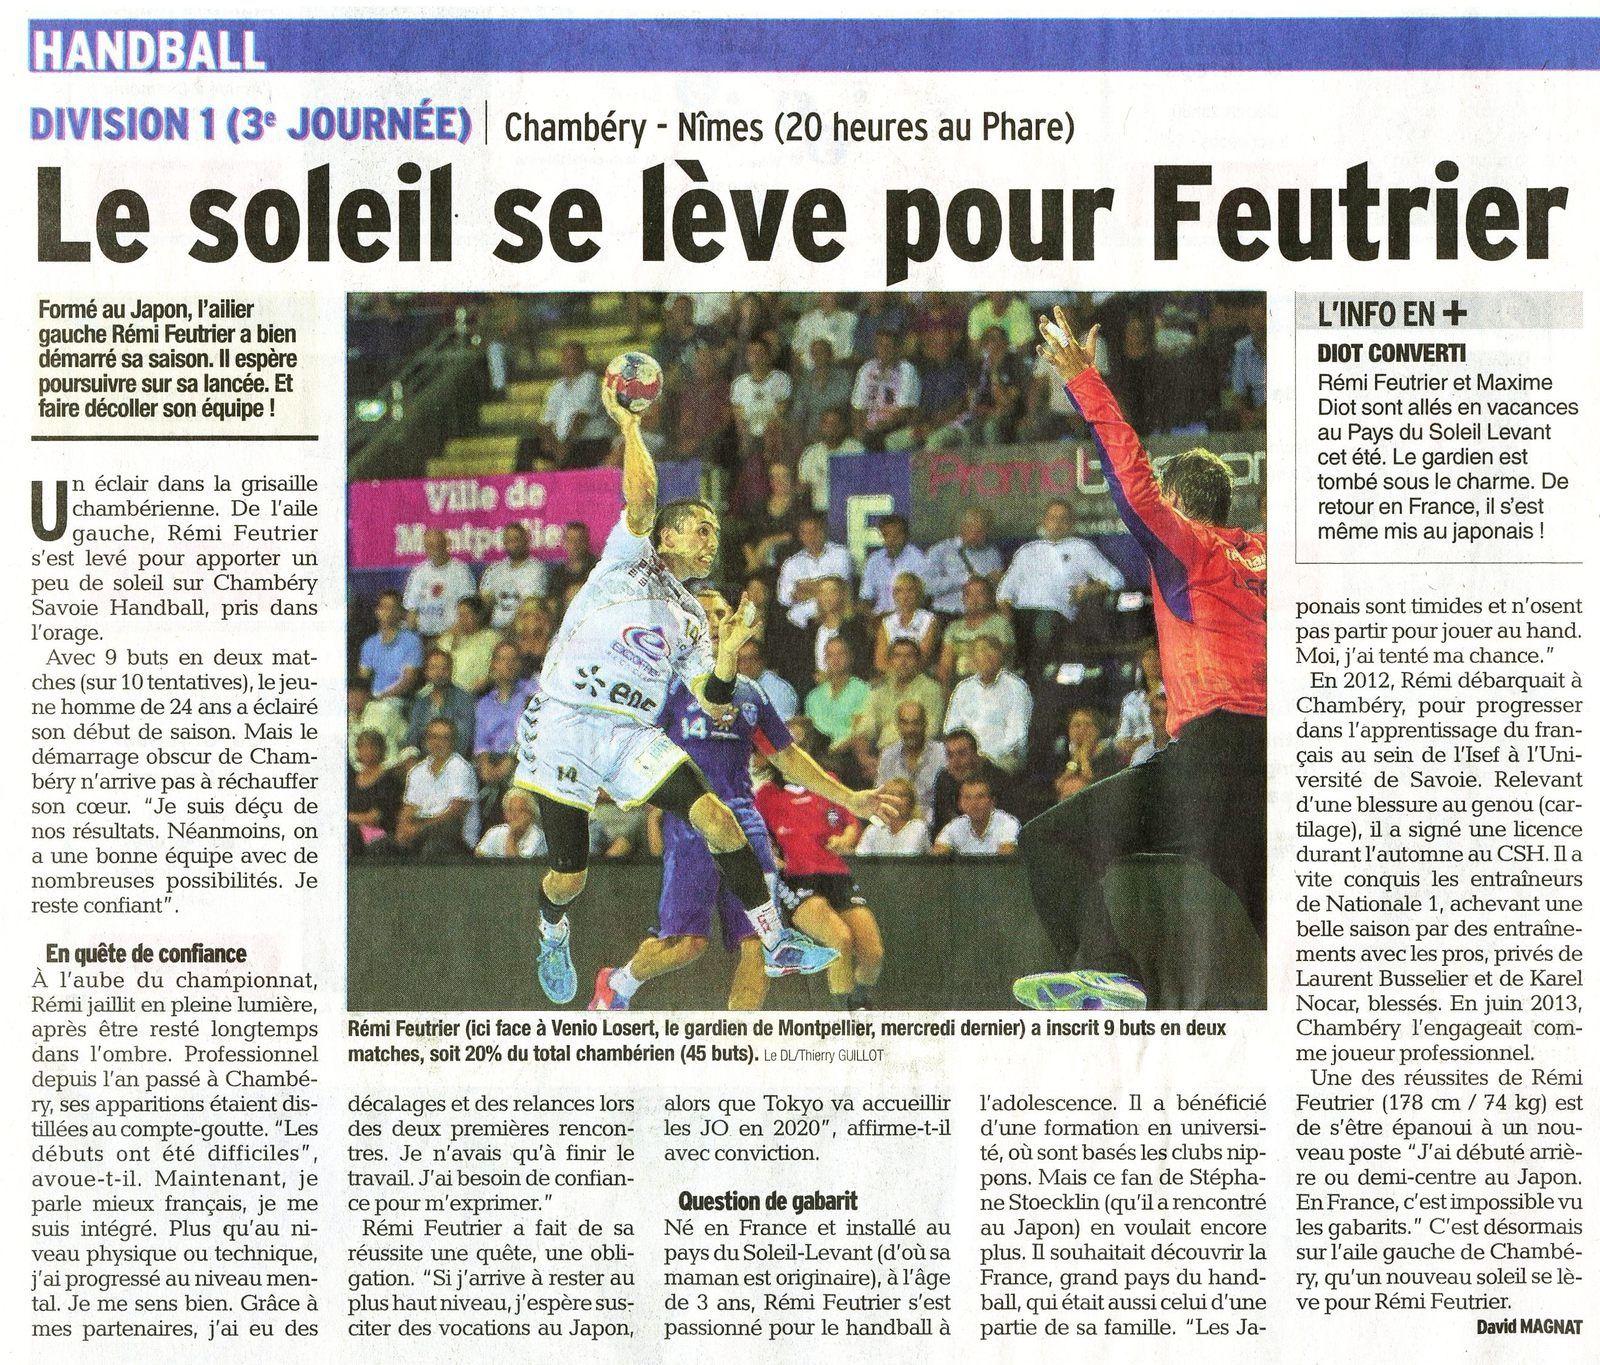 Dauphiné Libéré du jeudi 25 09 D1 CHAMBERY NÎMES avant match / David Magnat